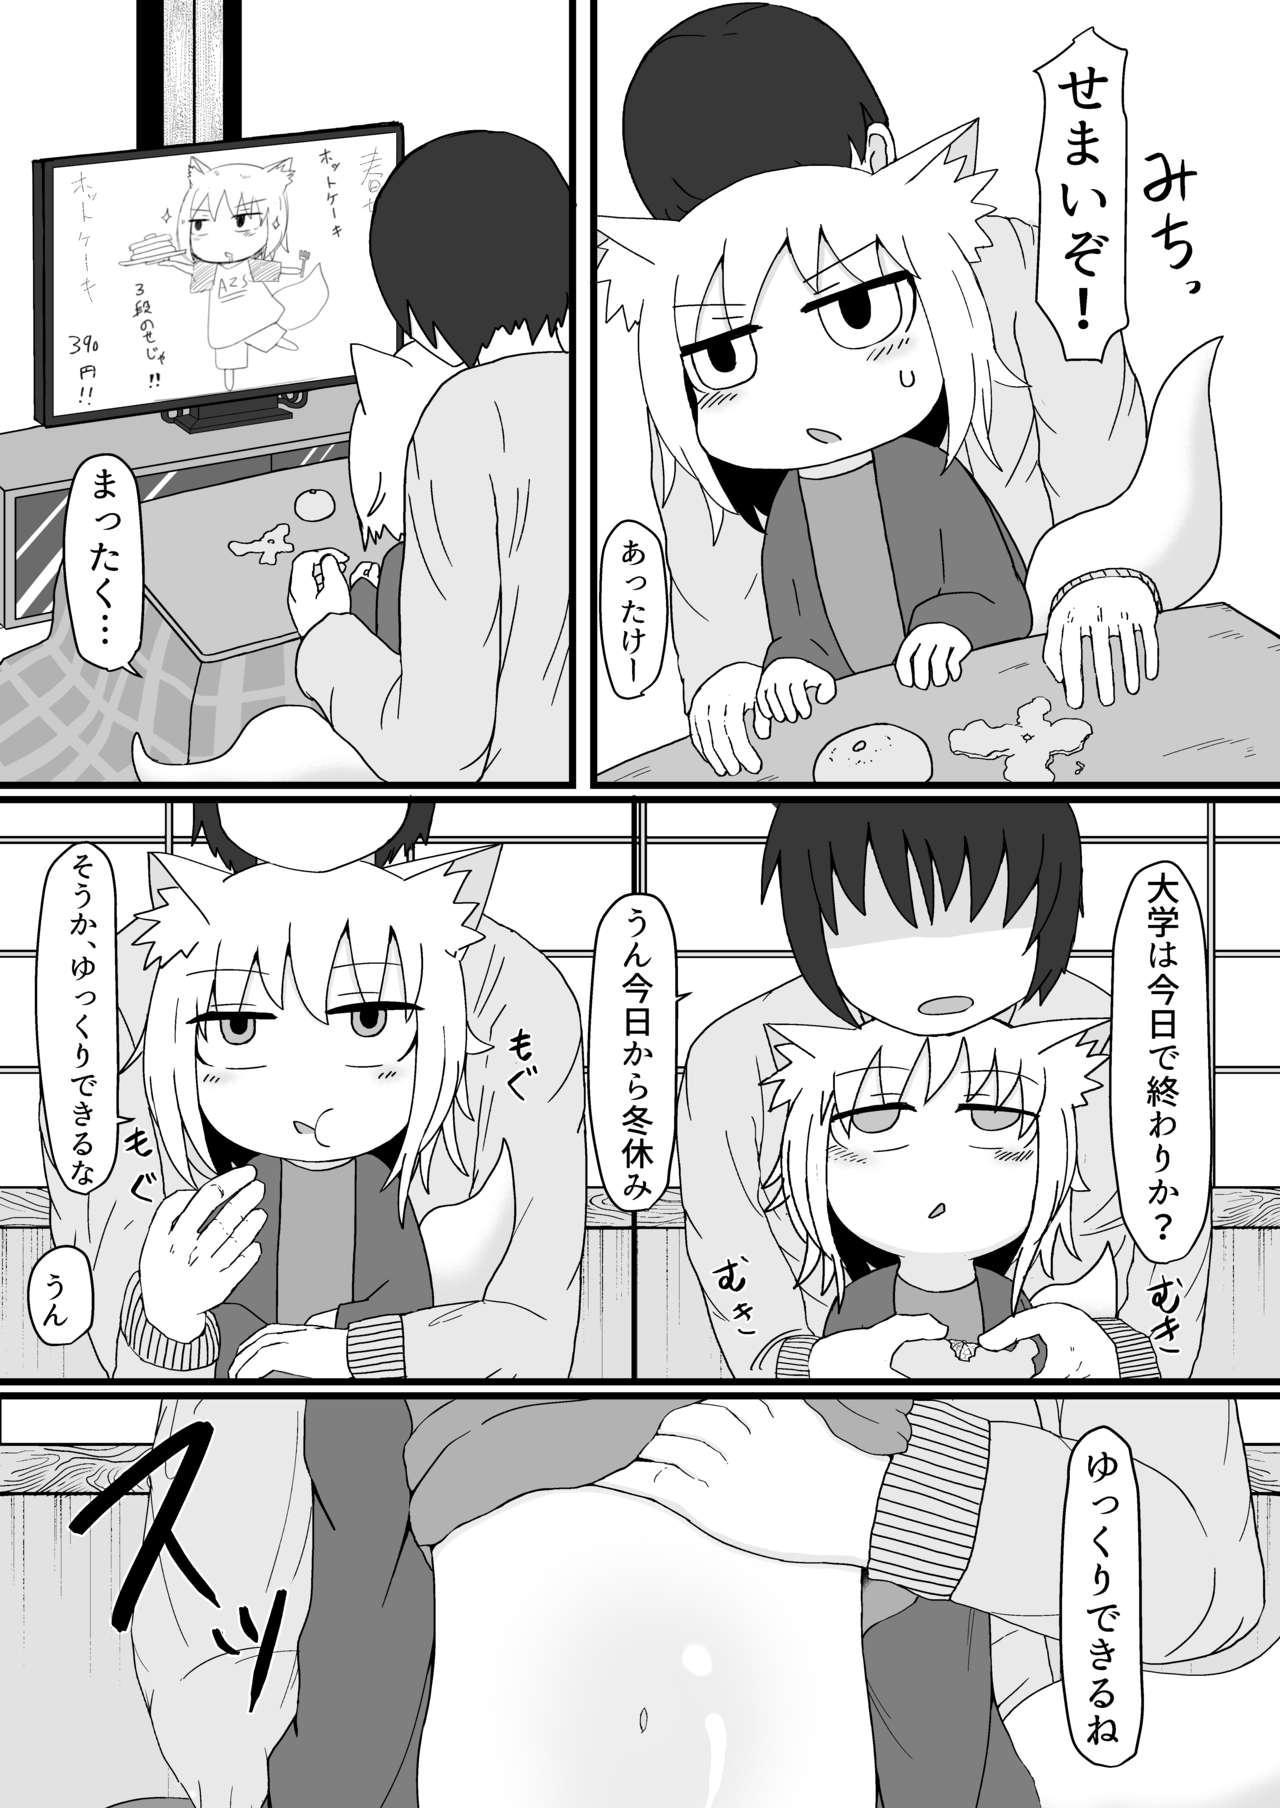 Loli Baba Okaa-san wa Oshi ni Yowai 2 6